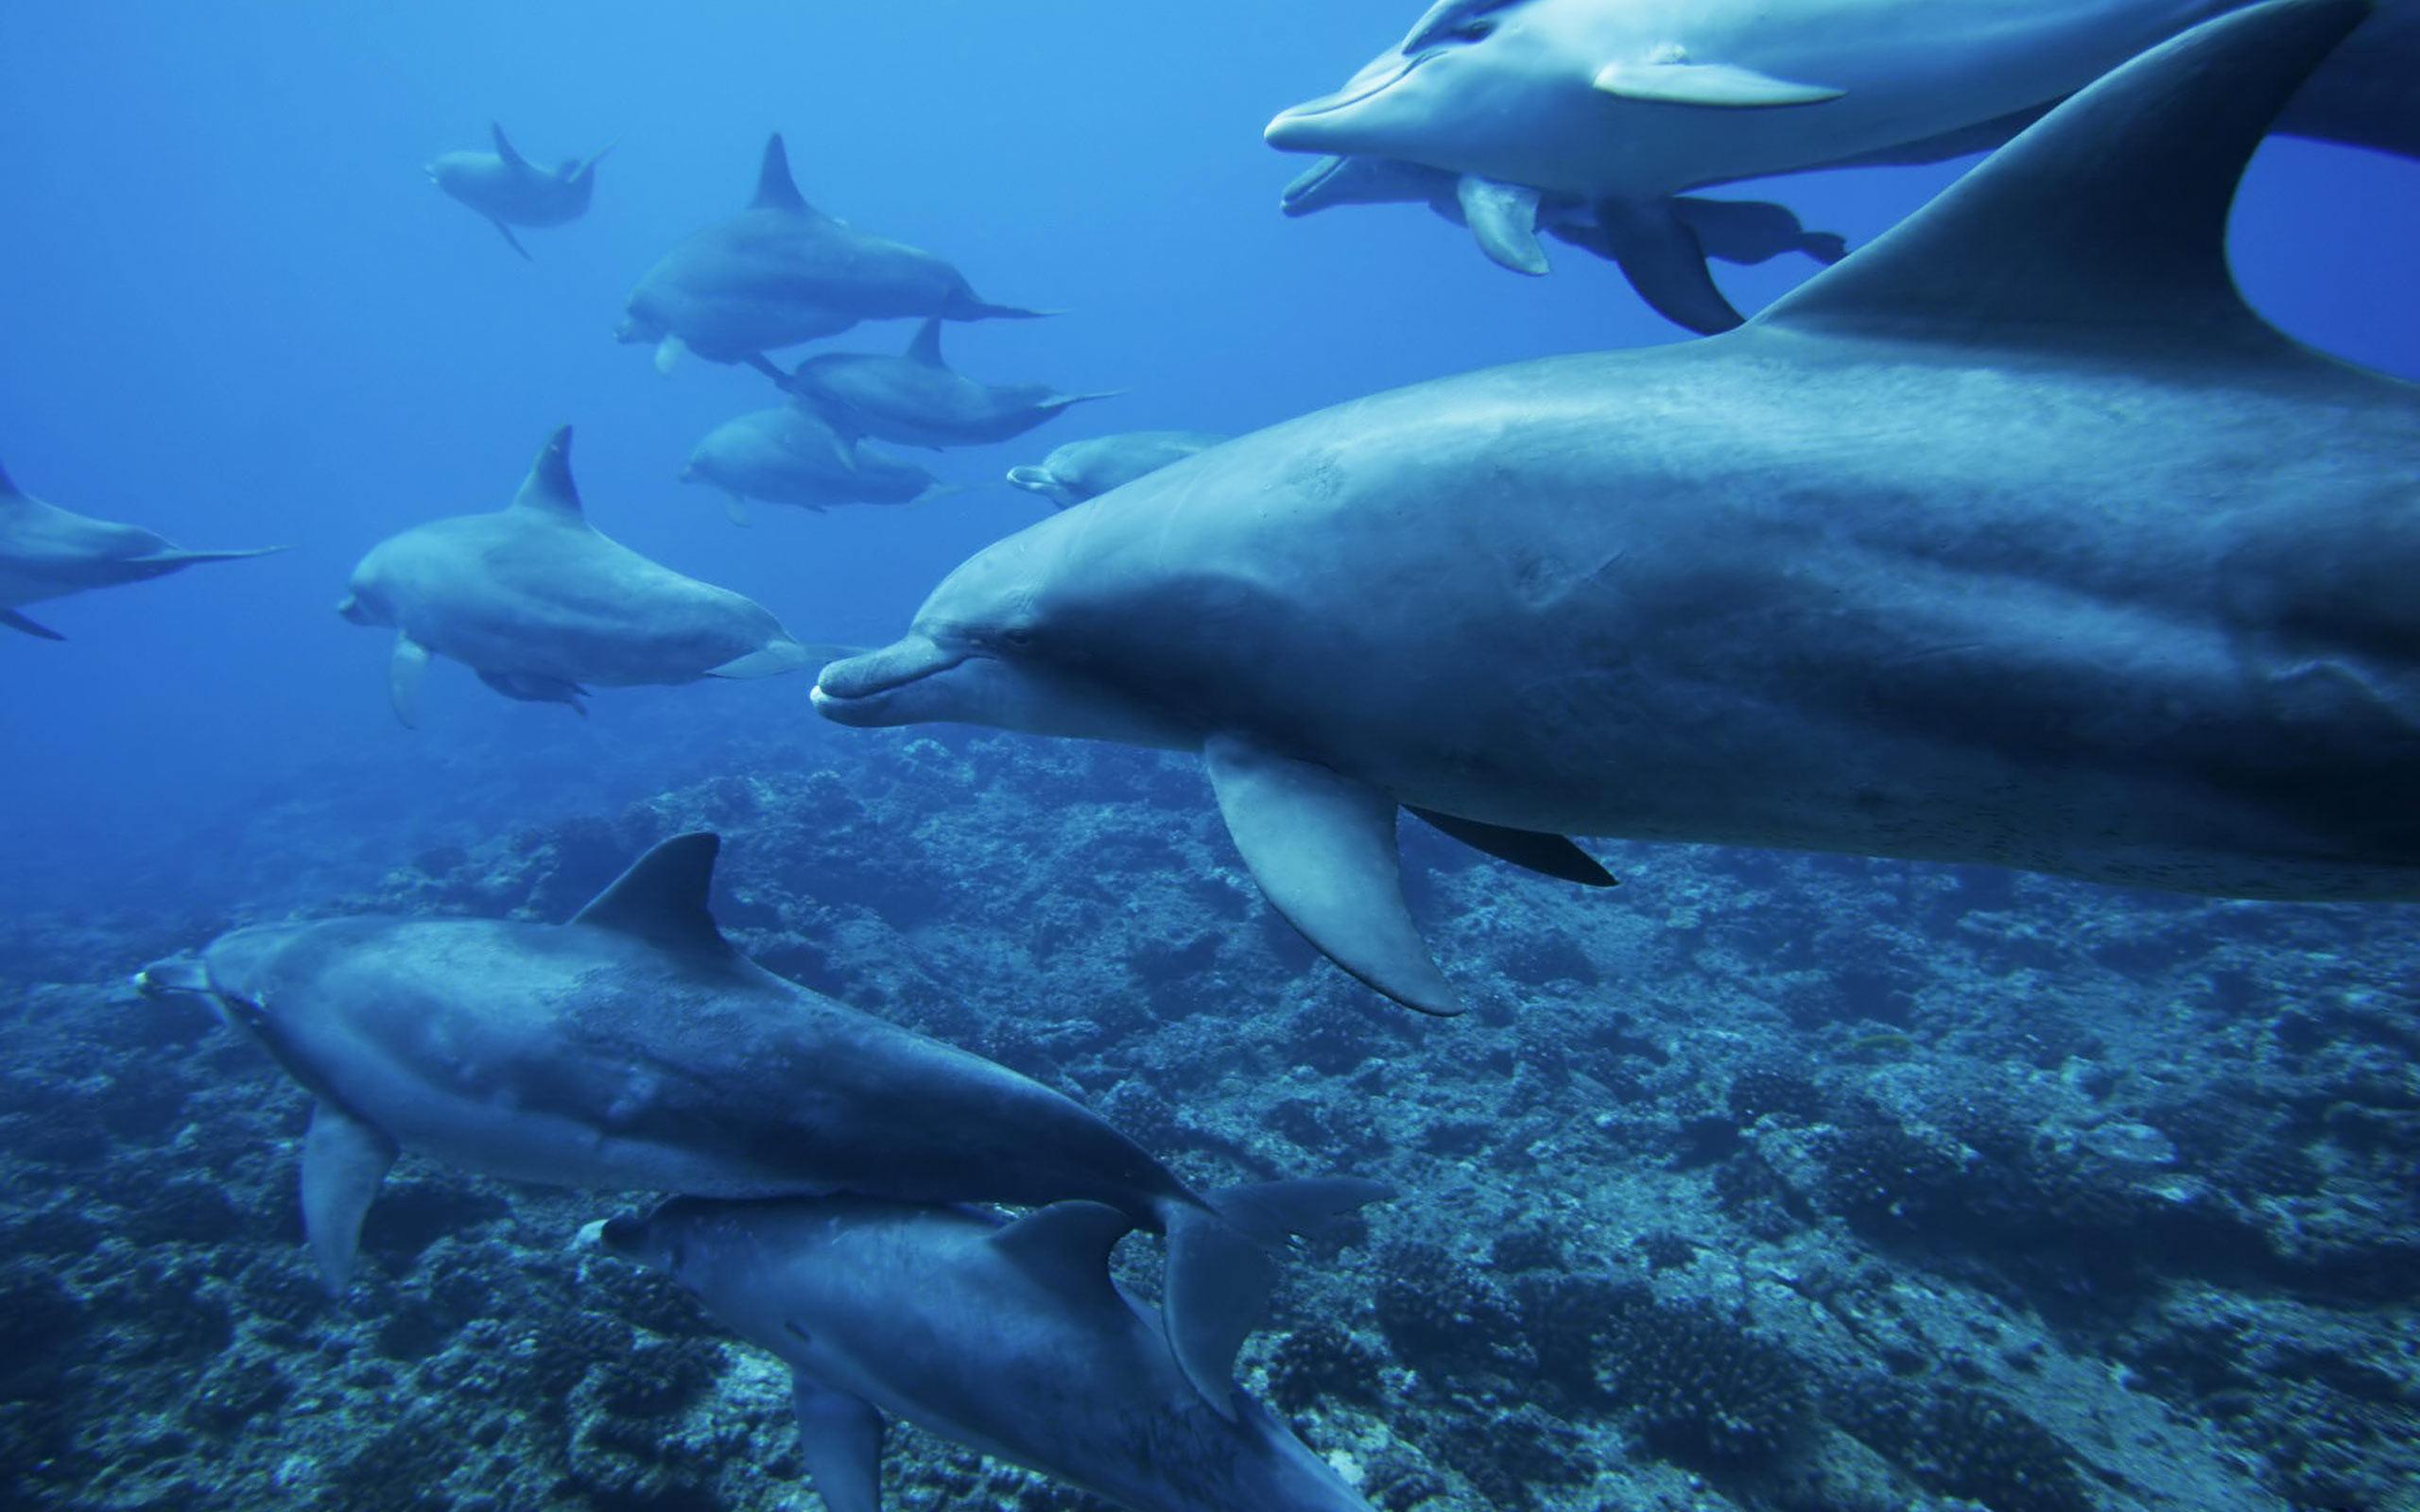 Ocean Animals – Animals Wallpaper (27960345) – Fanpop fanclubs